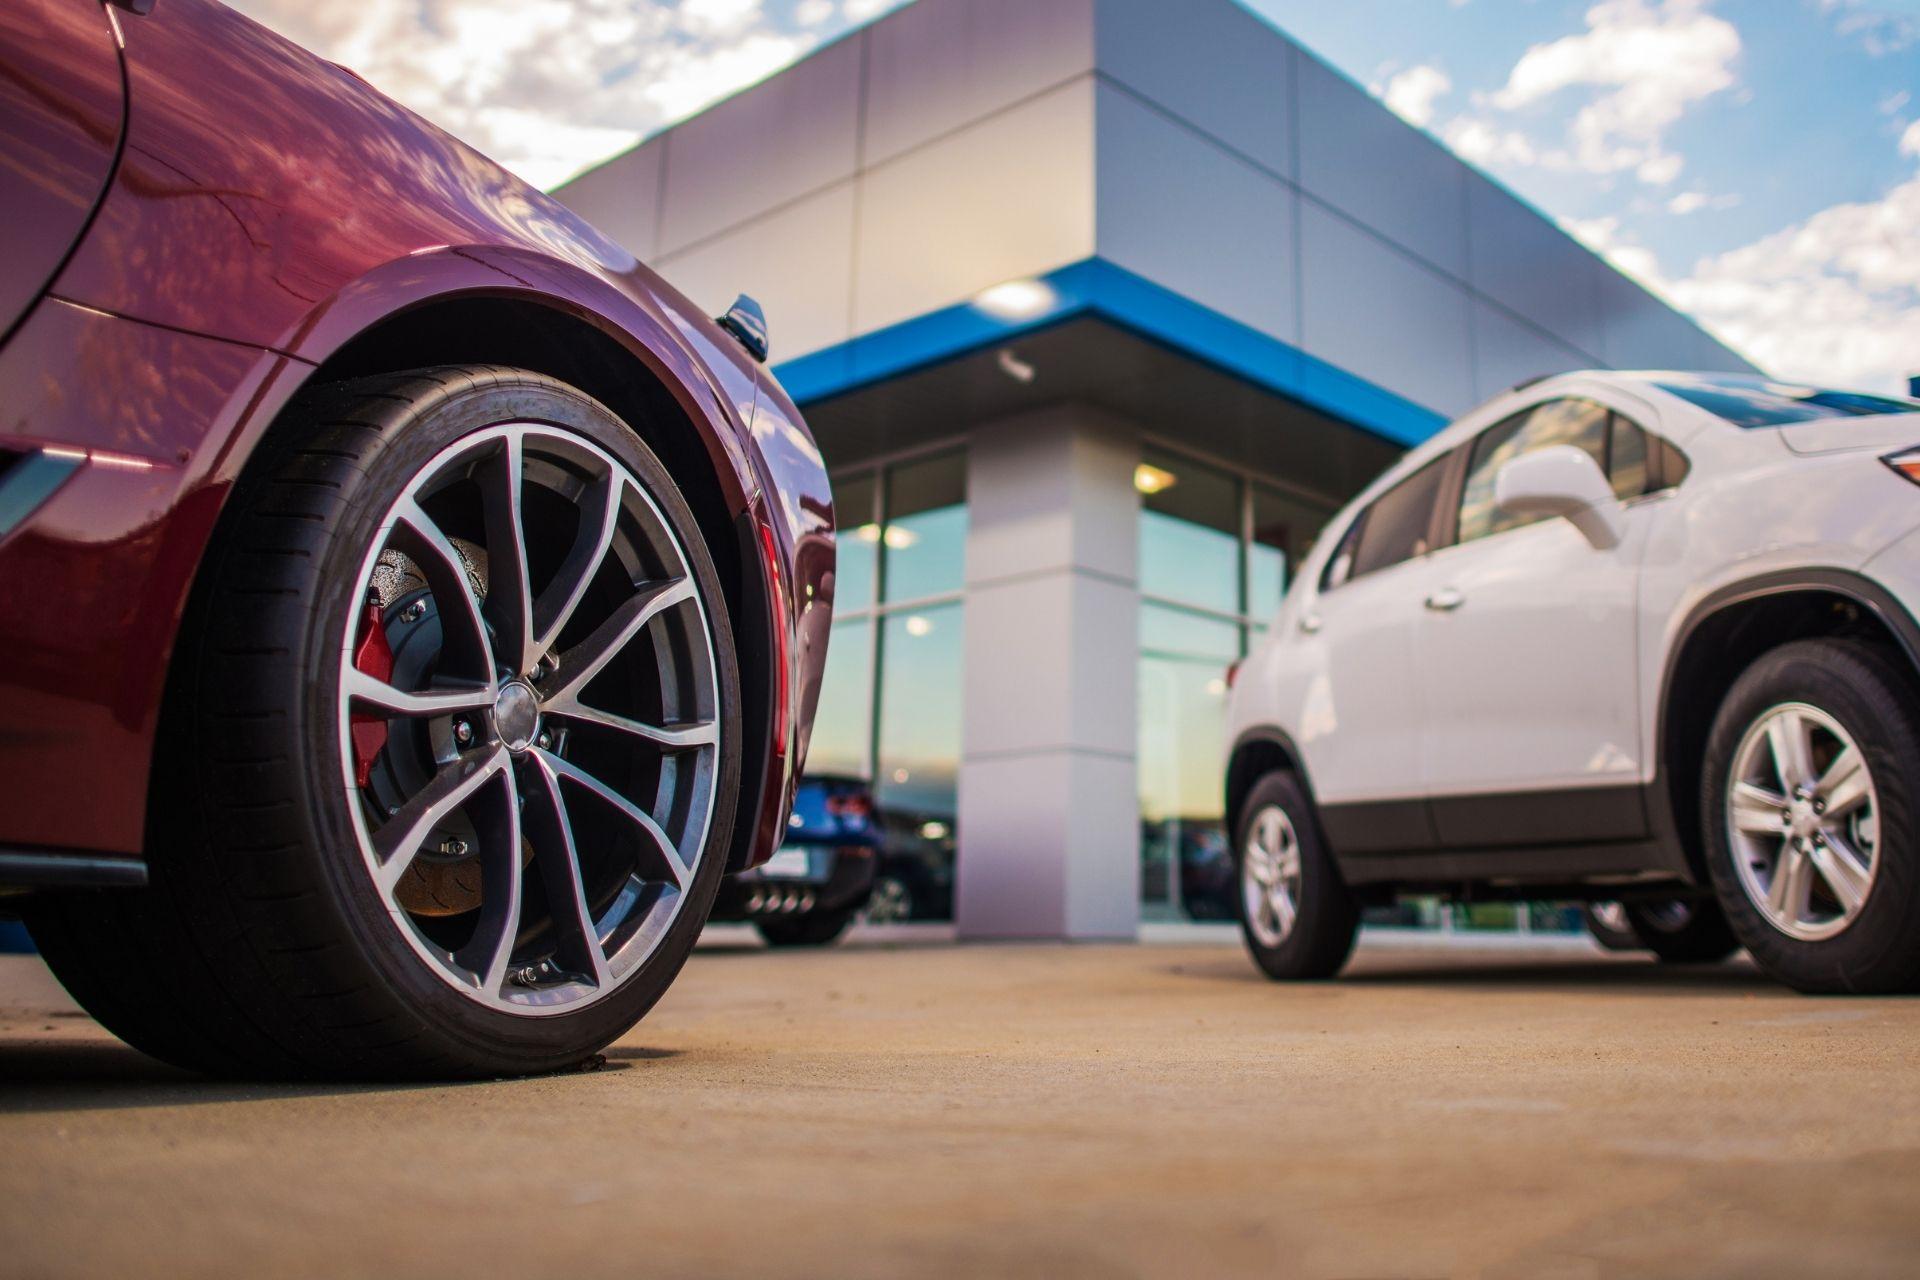 closeup of two vehicles on a car dealership car lot